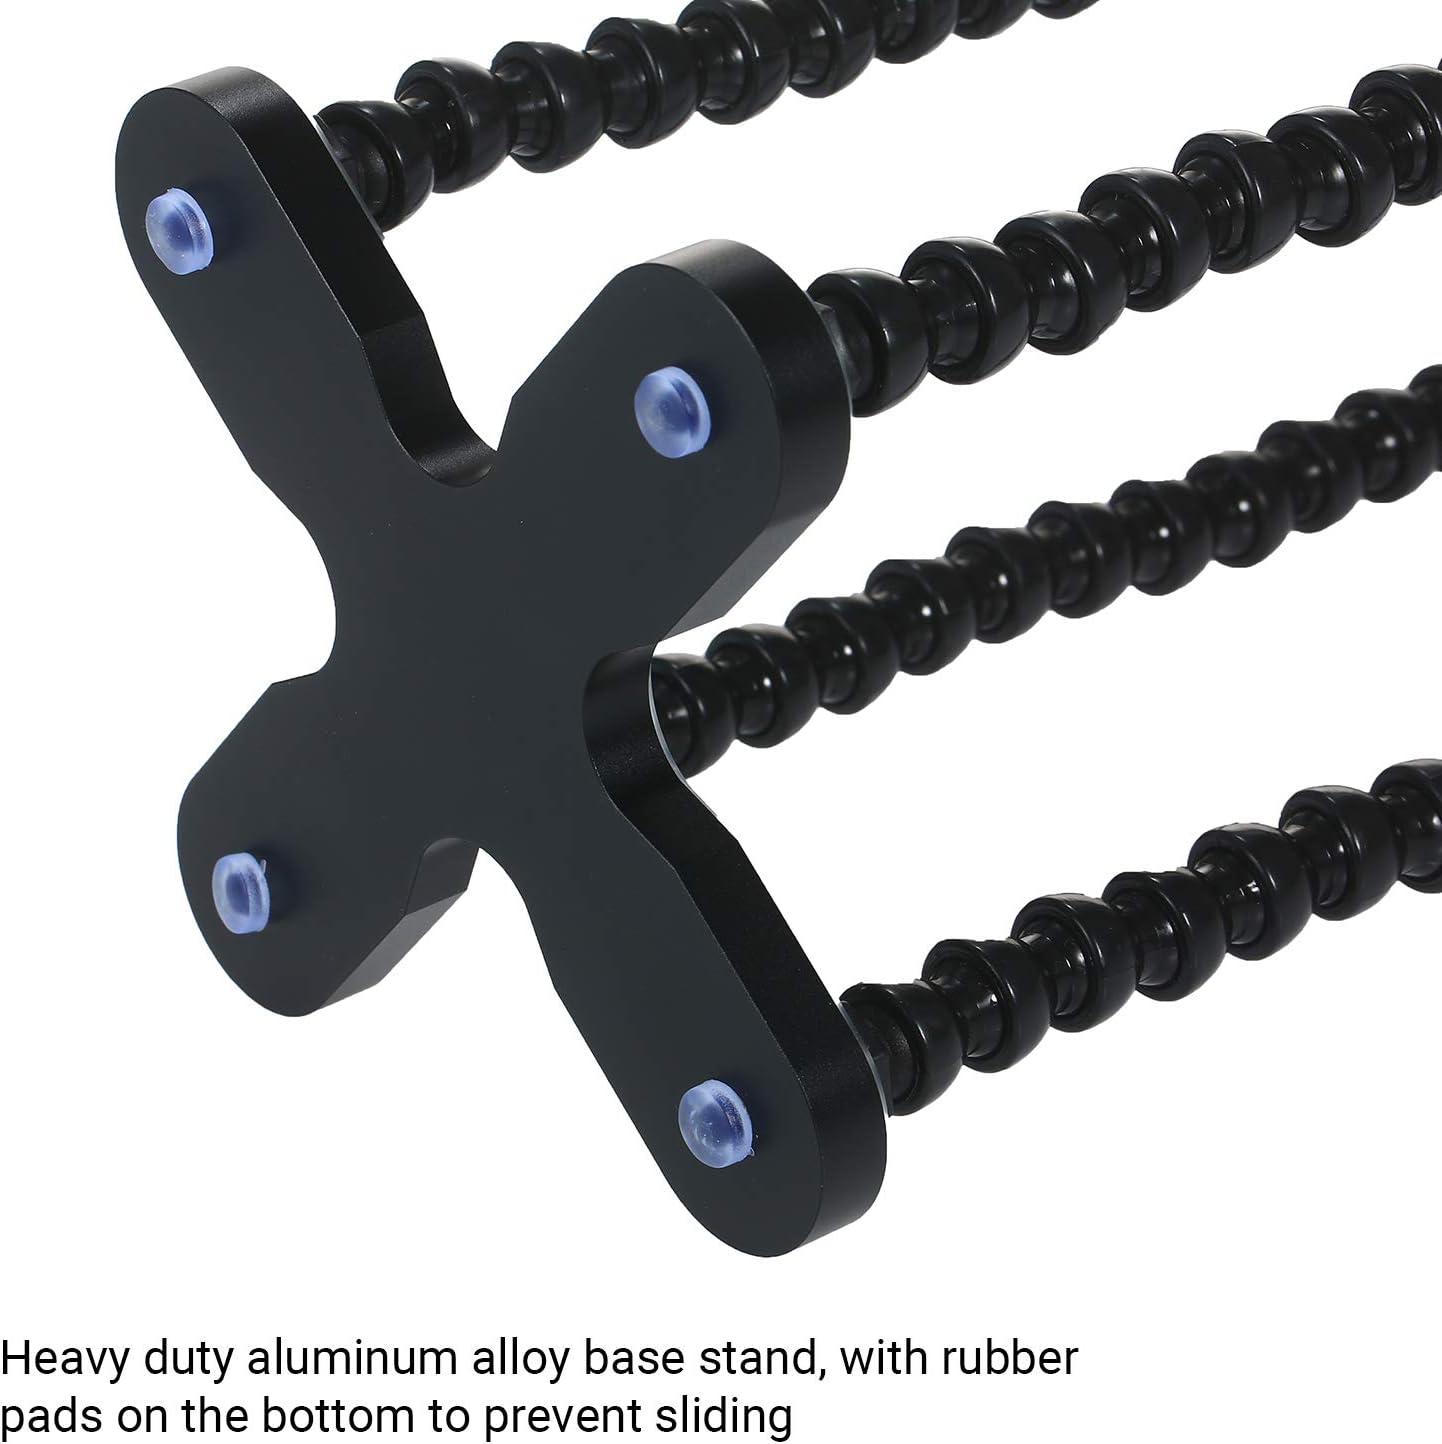 KKmoon Soldering Station Welding Repair Third Hand Multifunctional Welding Tool PCB Holder Flexible 4 Arm Alloy Stand